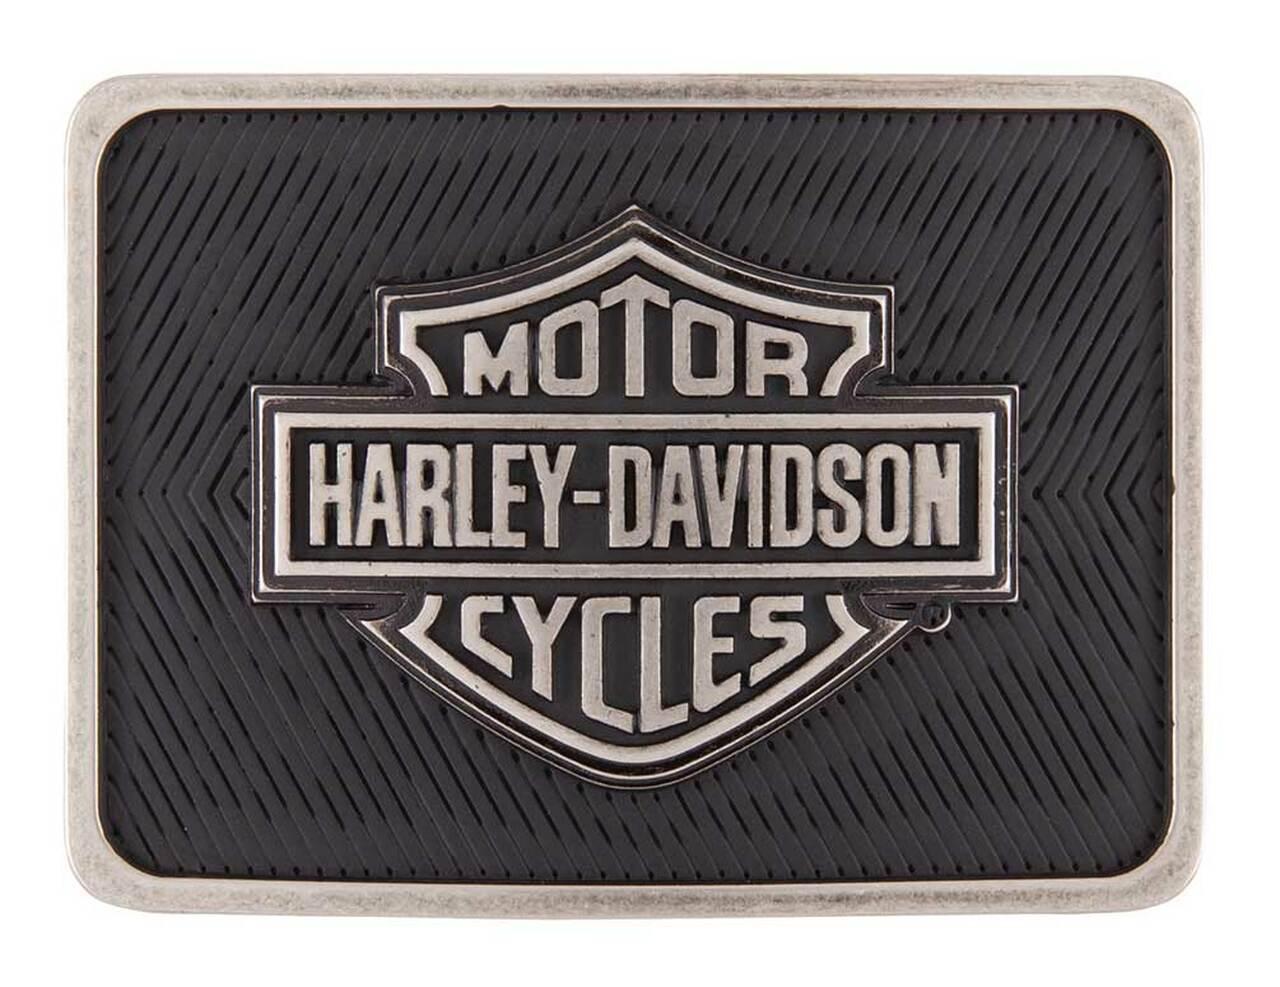 HARLEY DAVIDSON LEGACY BUCKLE